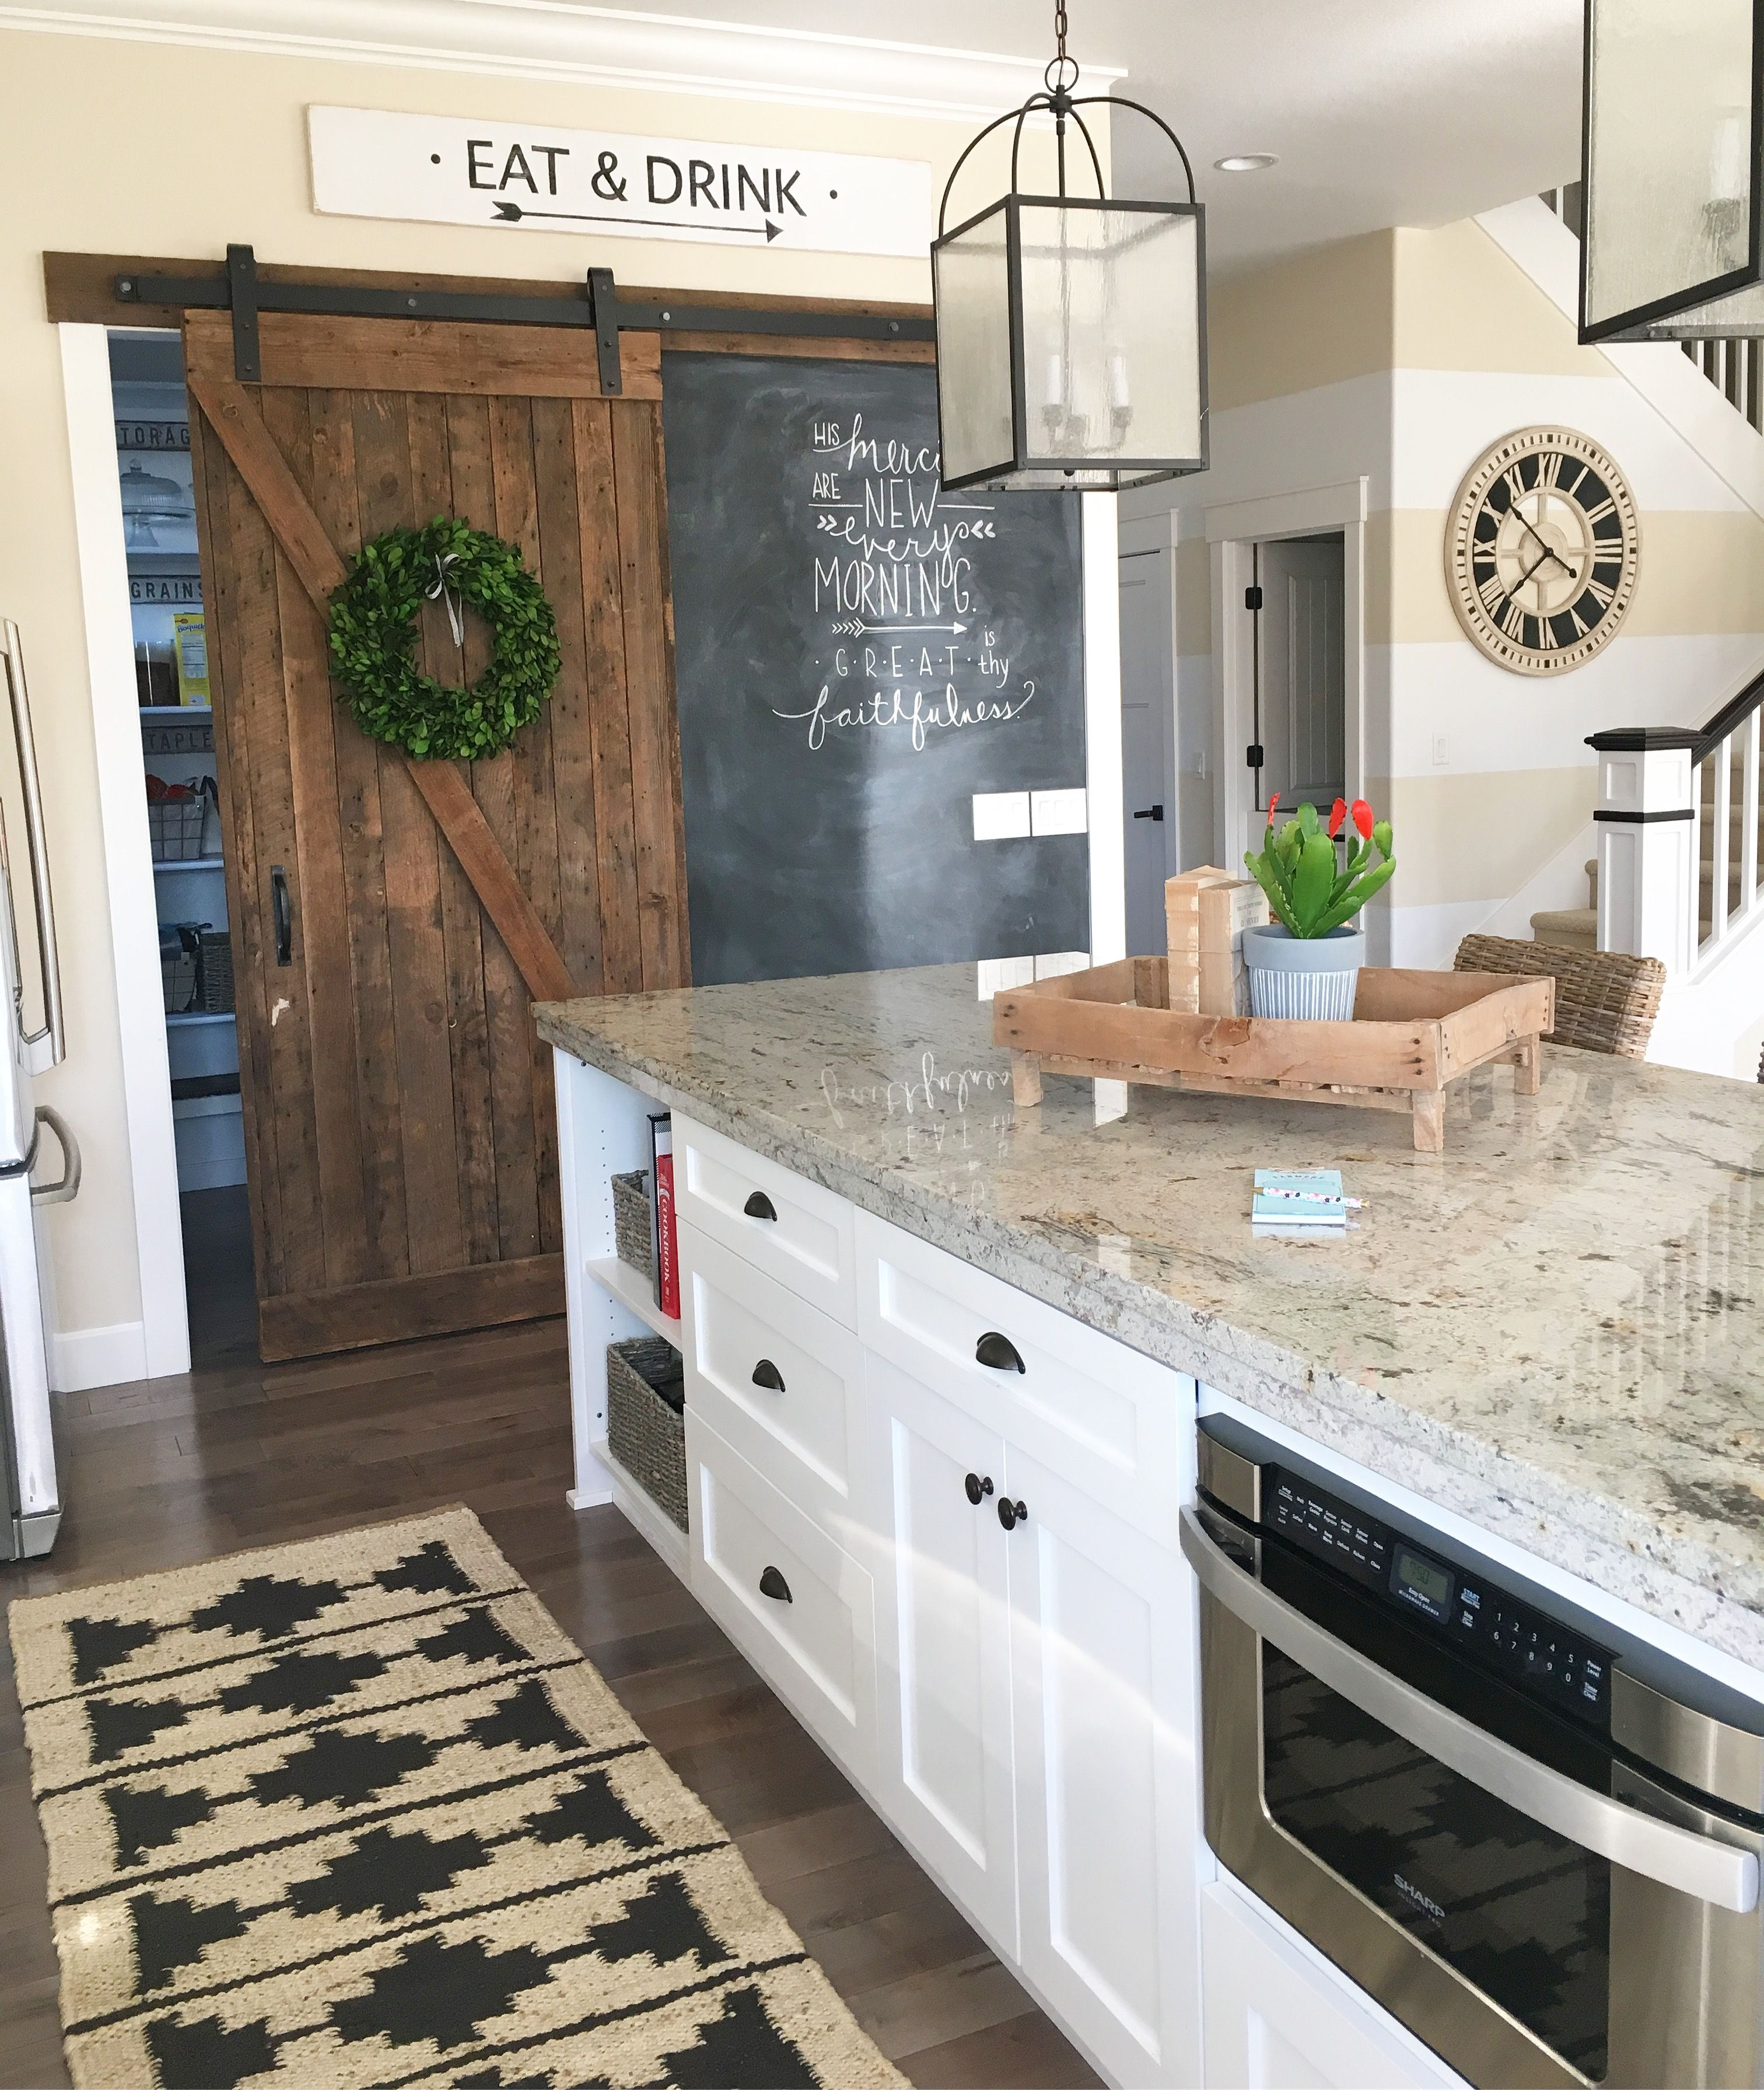 38 Dreamiest Farmhouse Kitchen Decor and Design Ideas to Fuel your